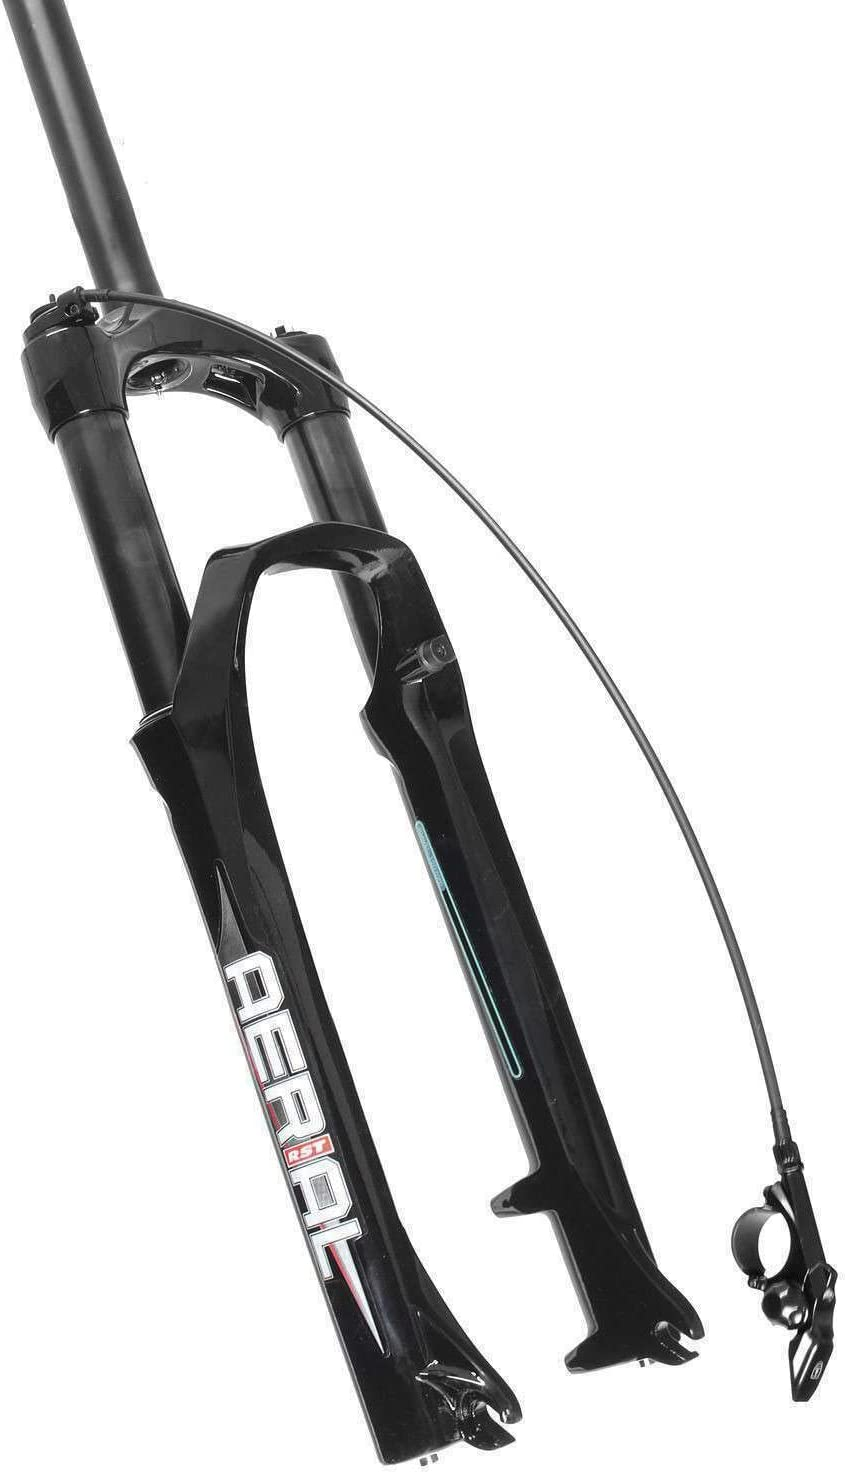 "RST First Mountain Bike Bicycle 26/"" x 100mm Remote Disc Brake Fork White"